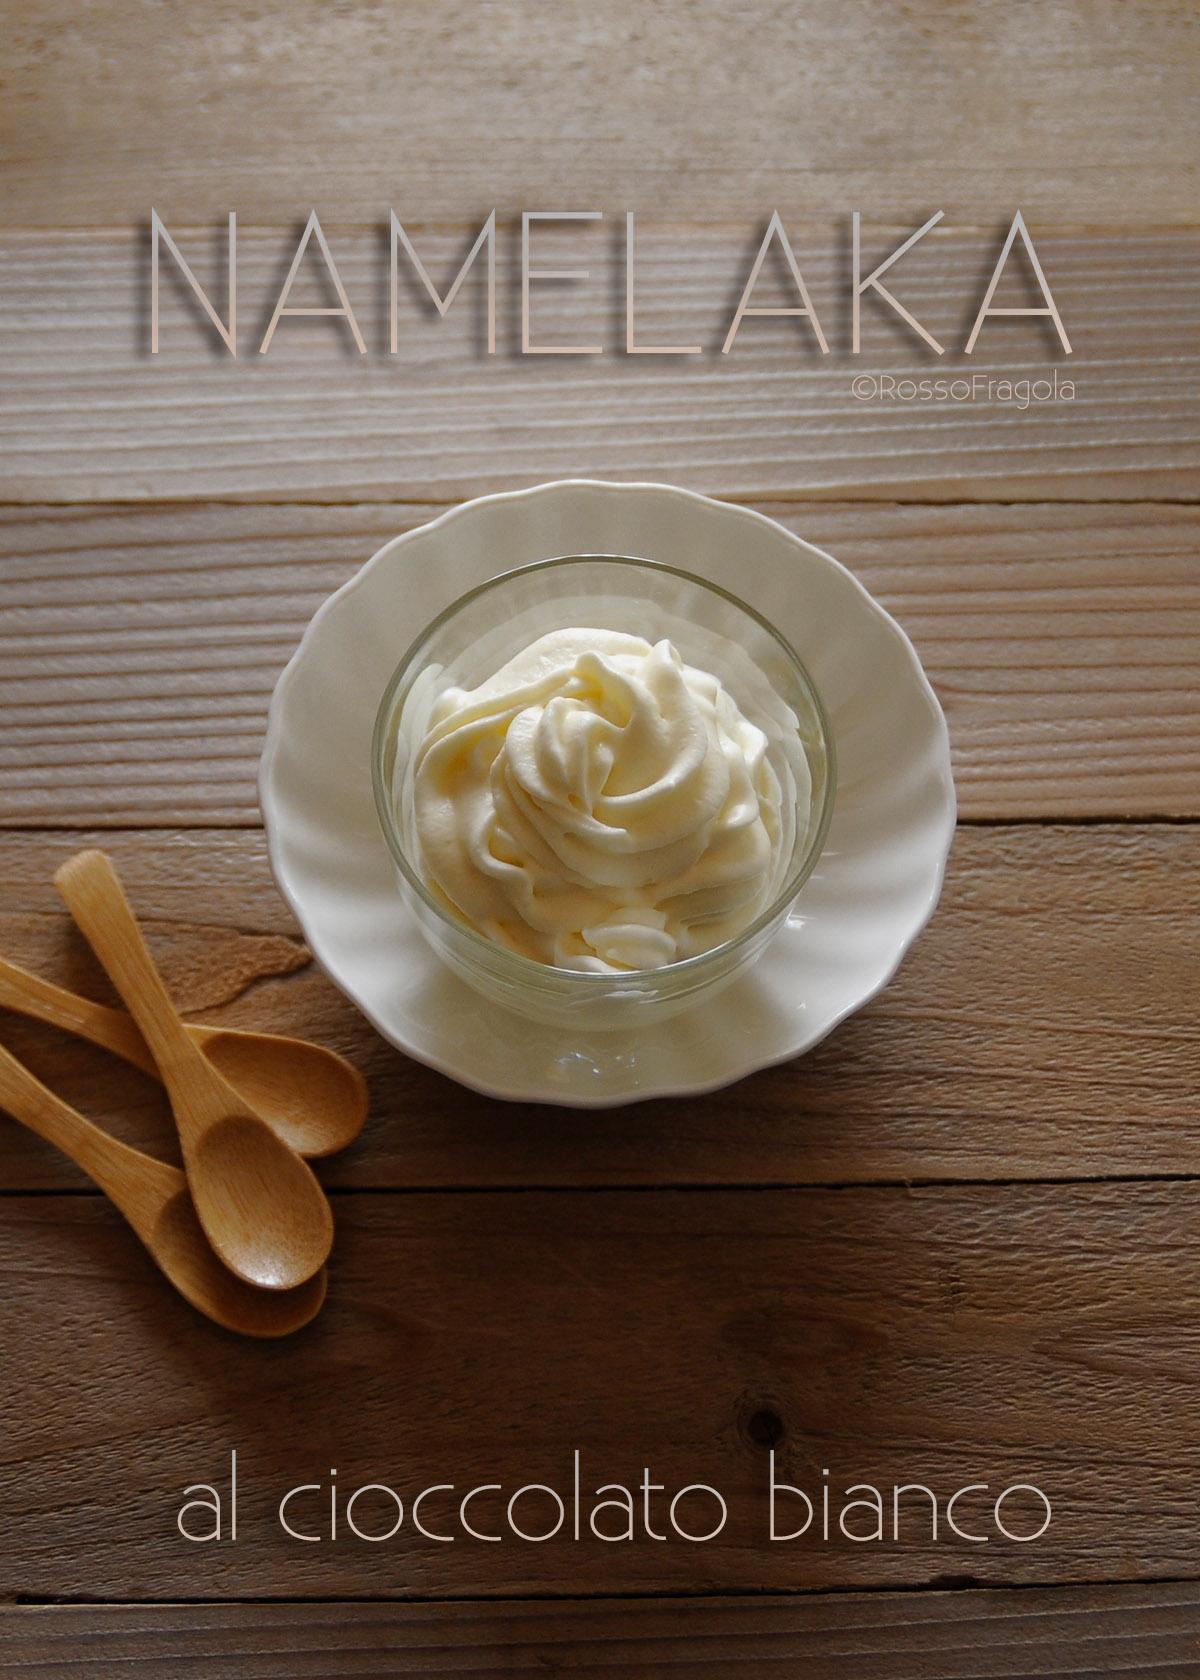 namelaka-al-cioccolato-bianco